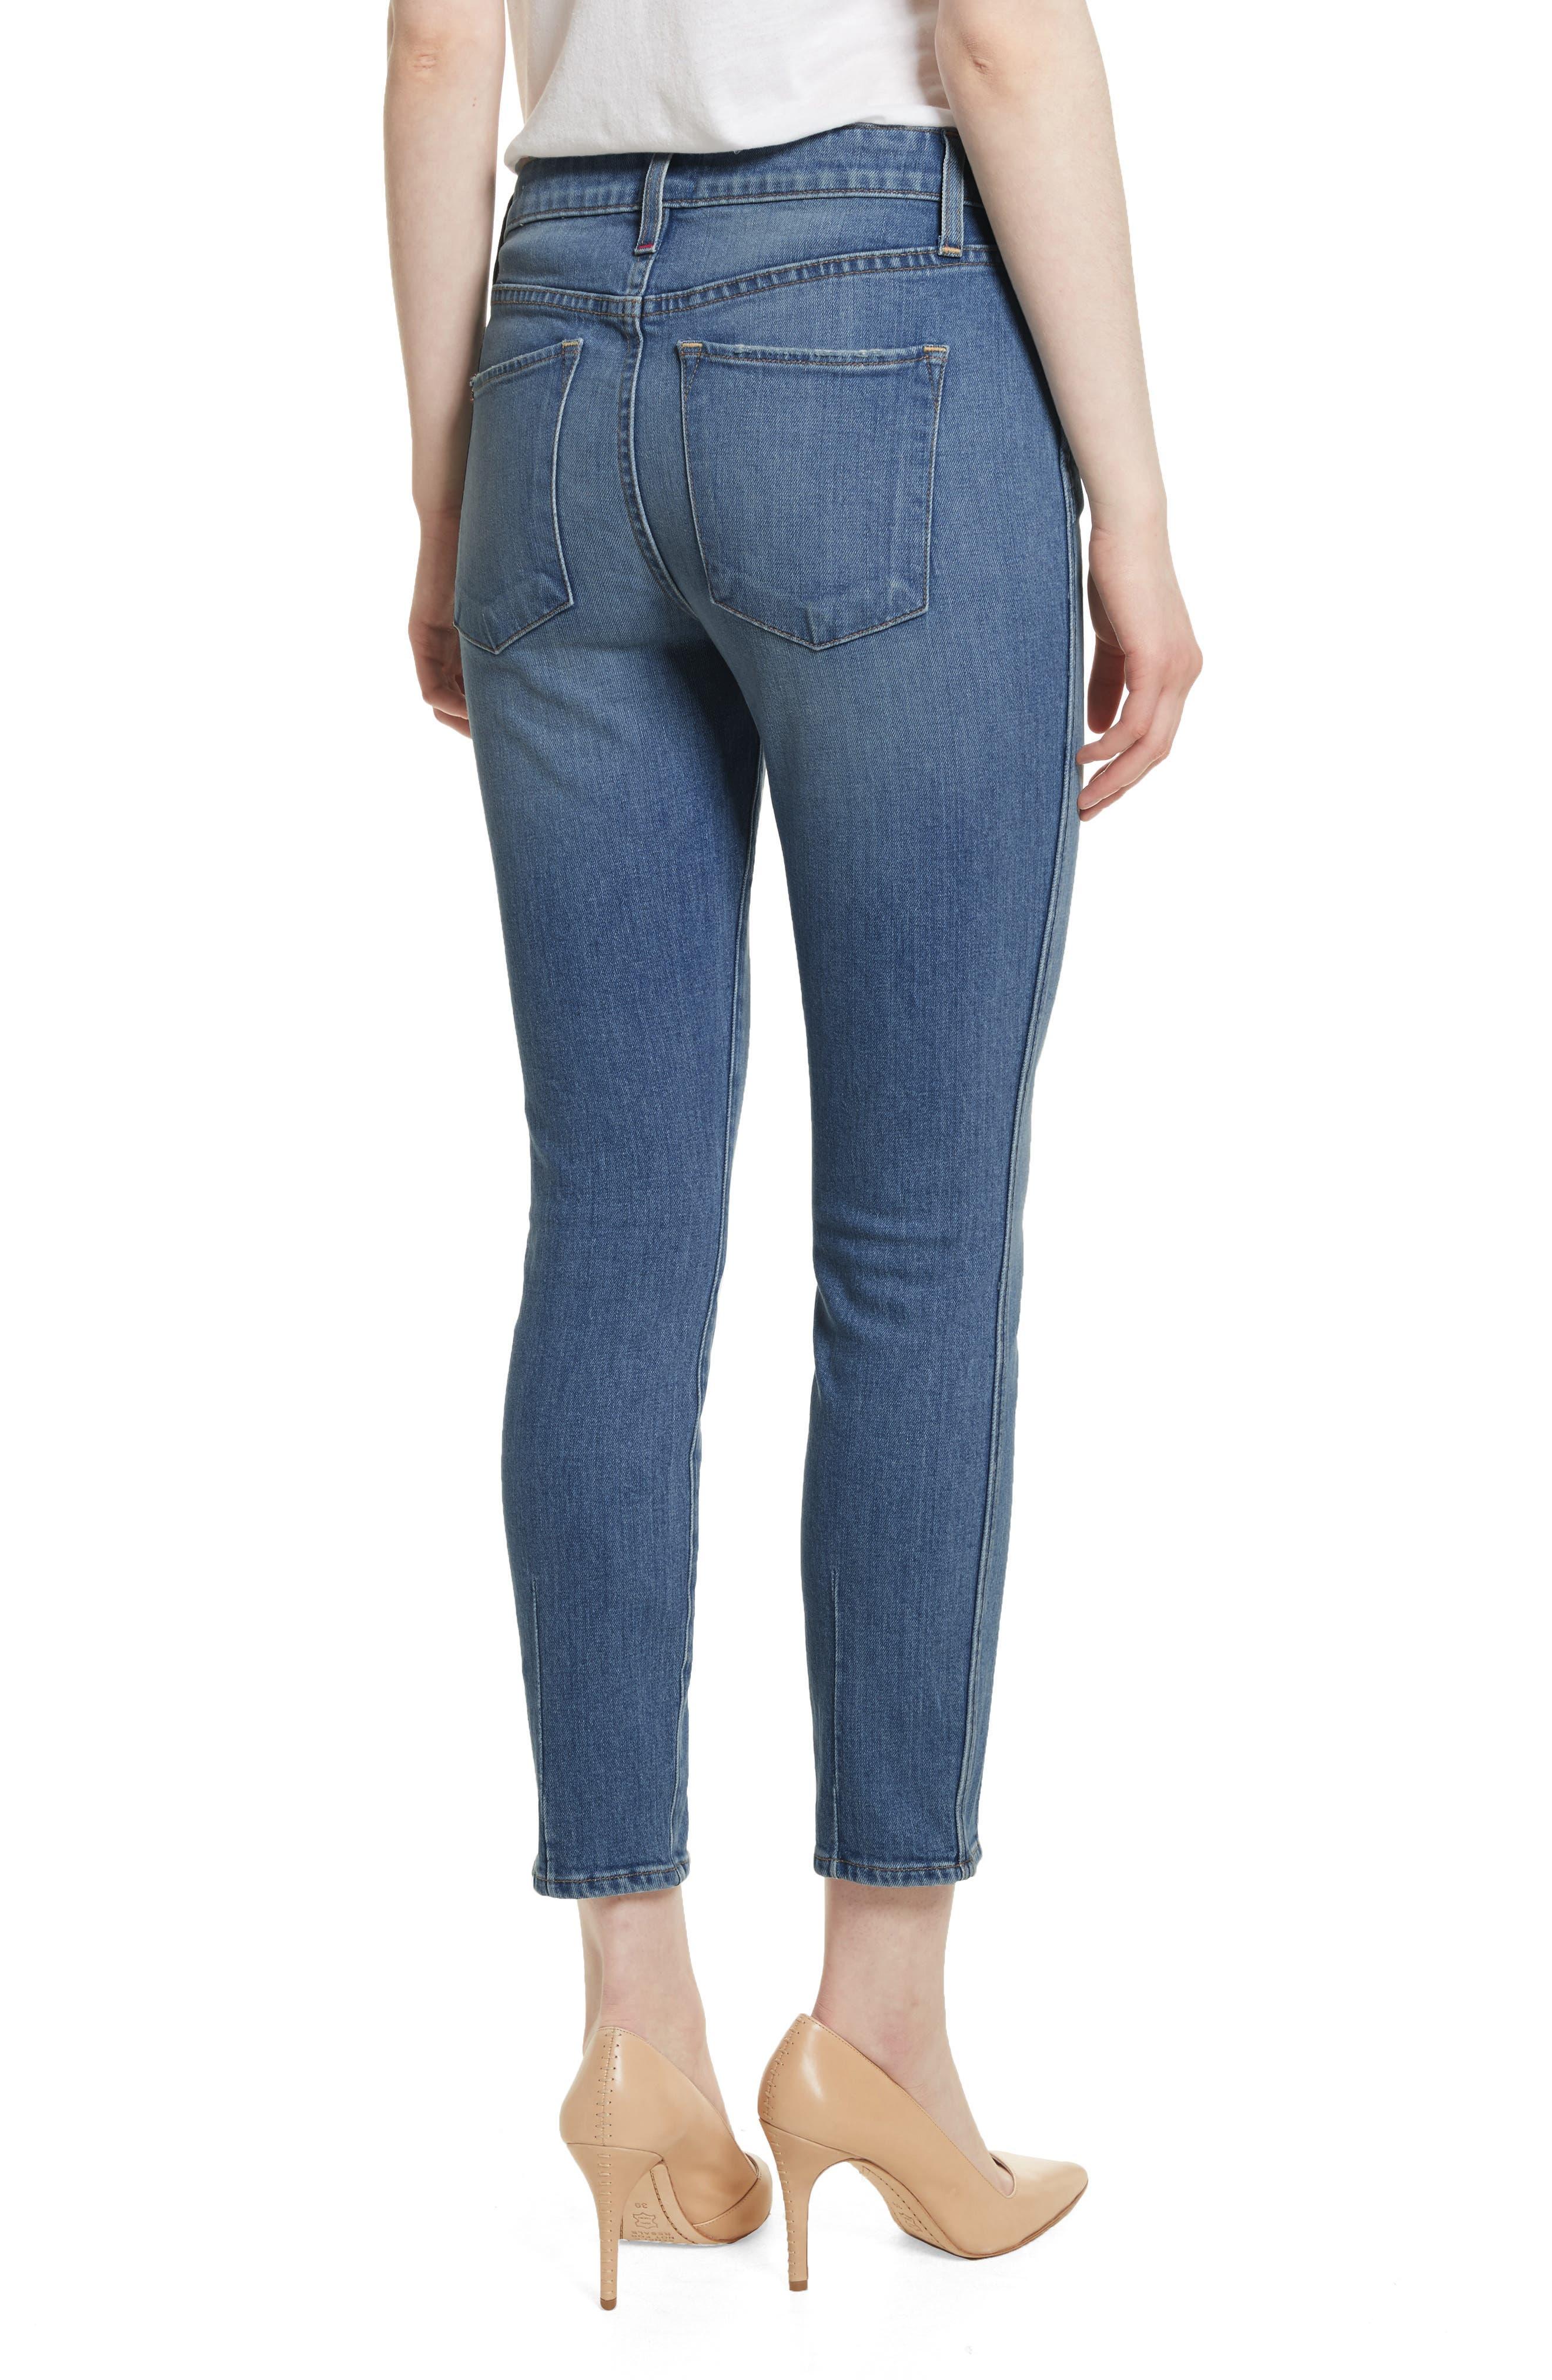 AO.LA Good Ankle Skinny Jeans,                             Alternate thumbnail 2, color,                             SWEET EMOTION